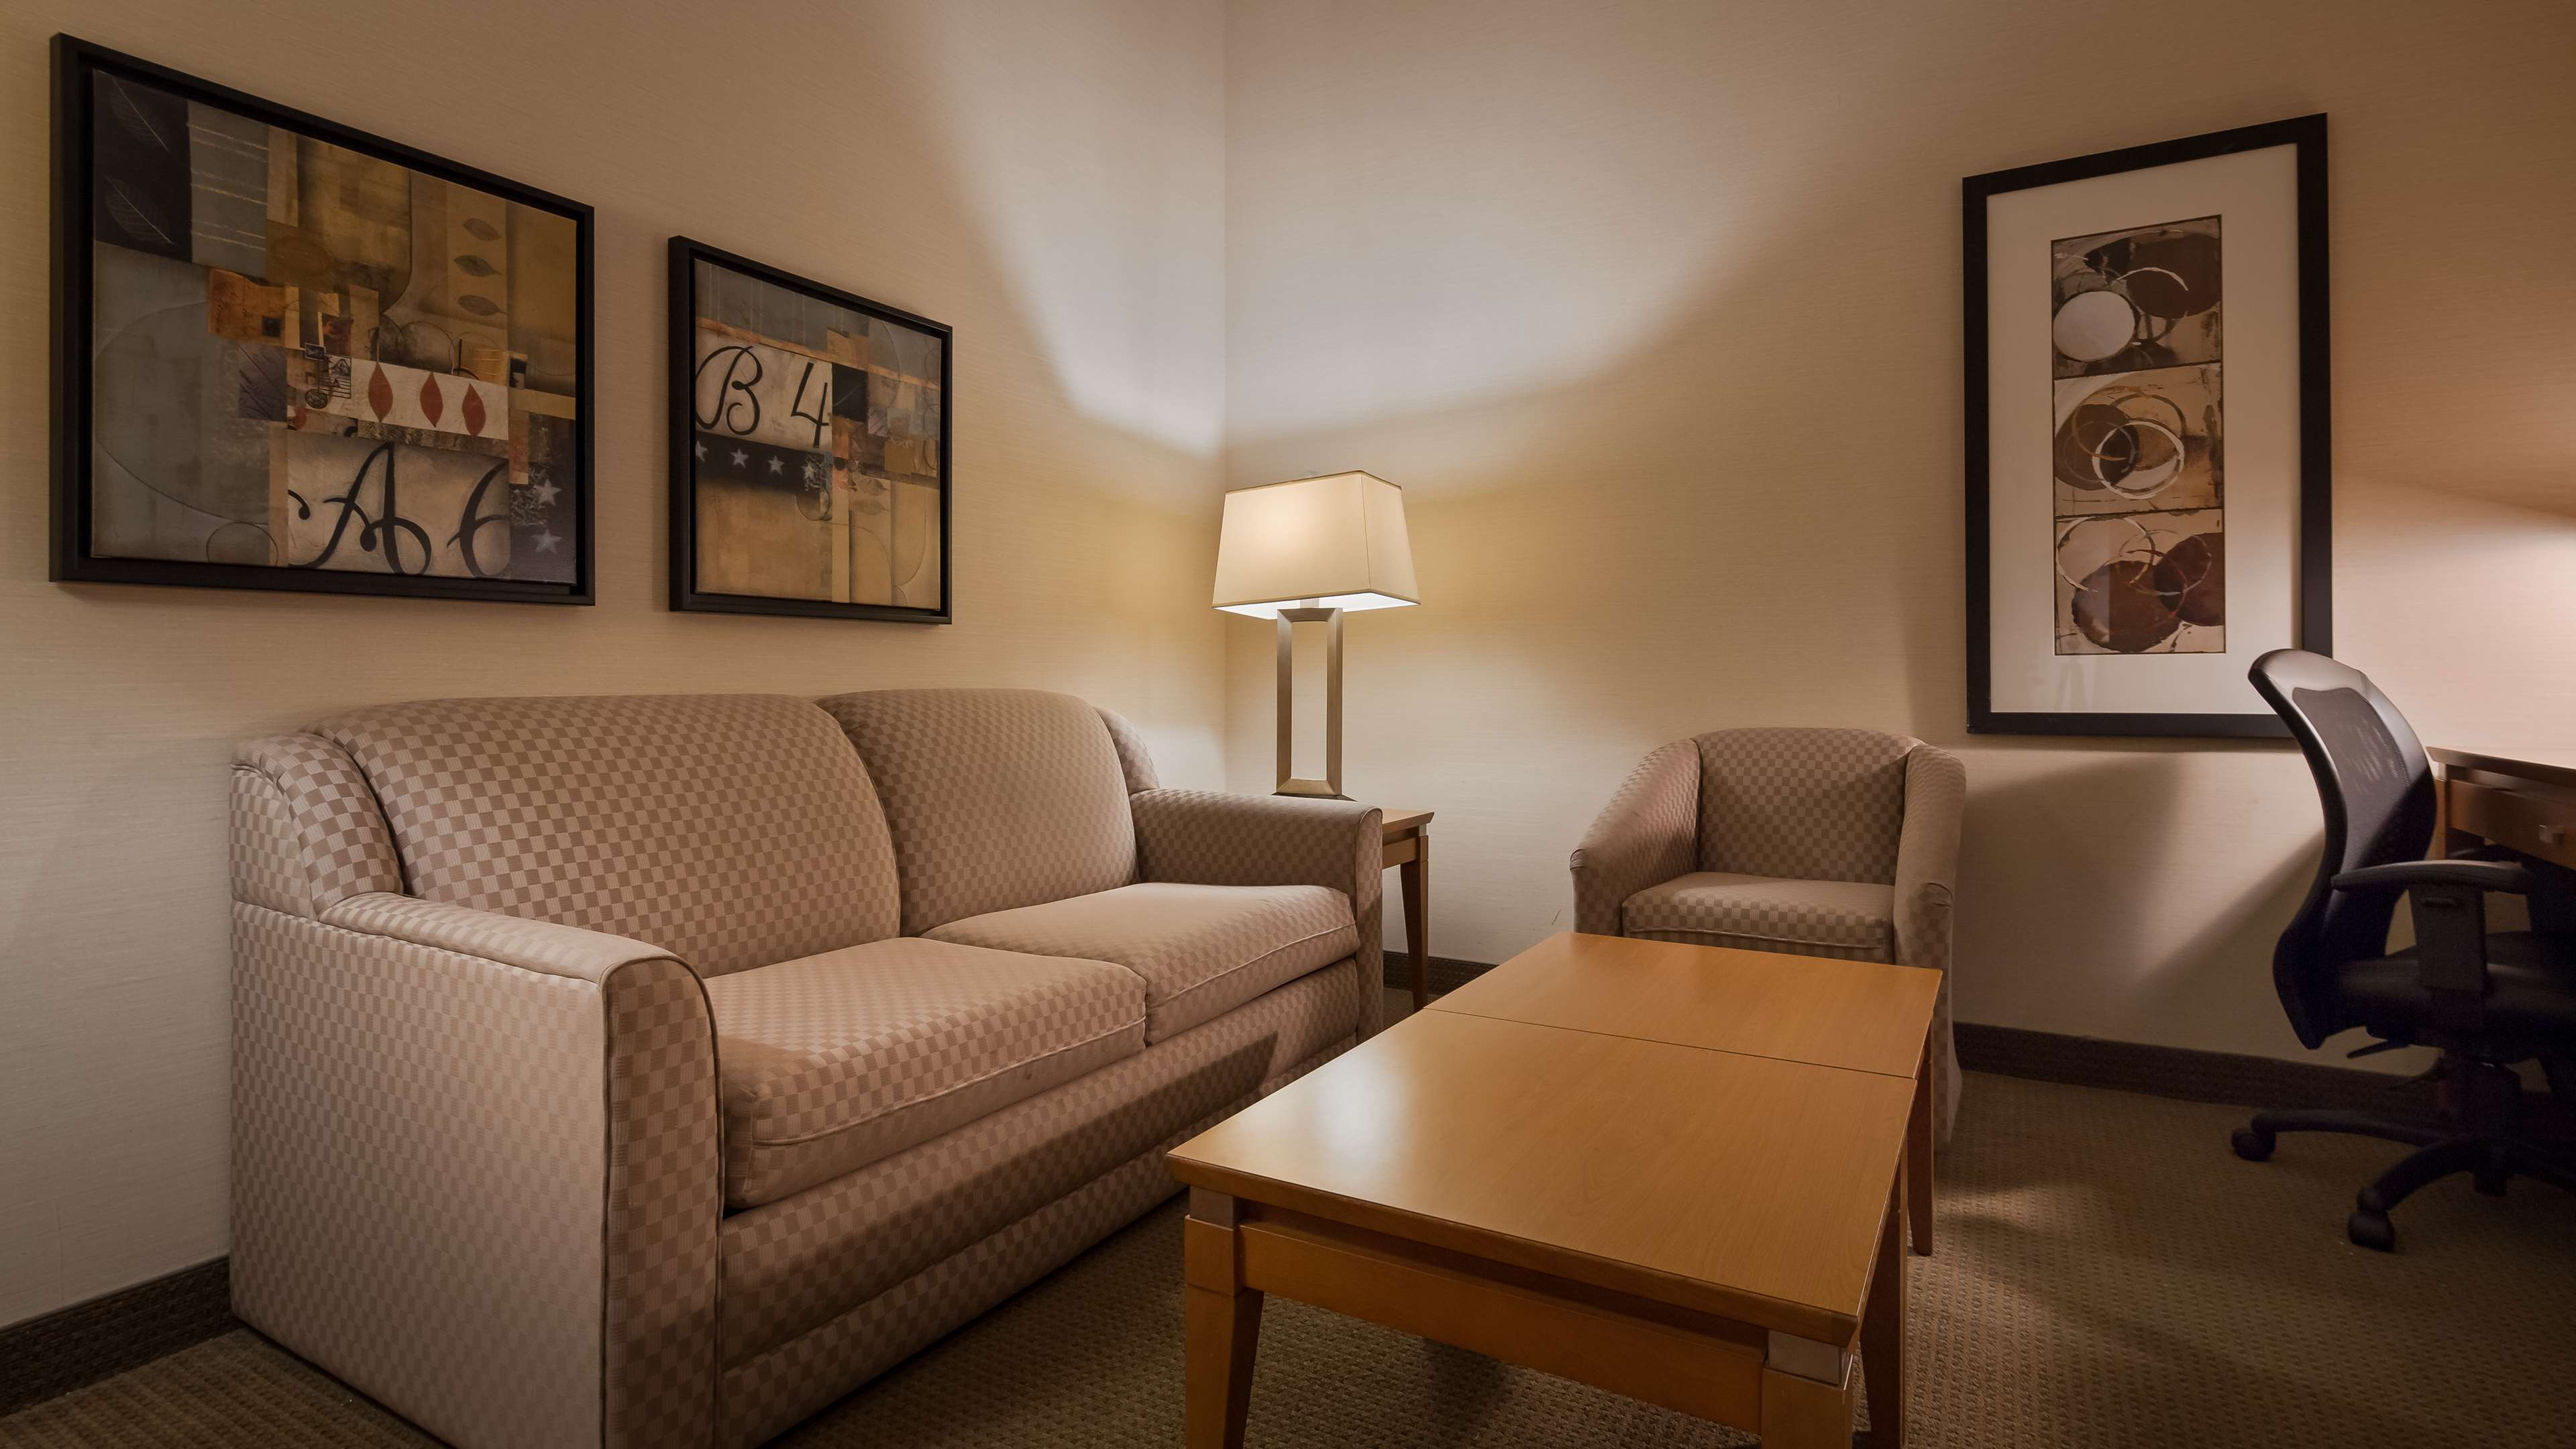 Guest Suite Best Western Plus Orangeville Inn & Suites Orangeville (519)941-3311